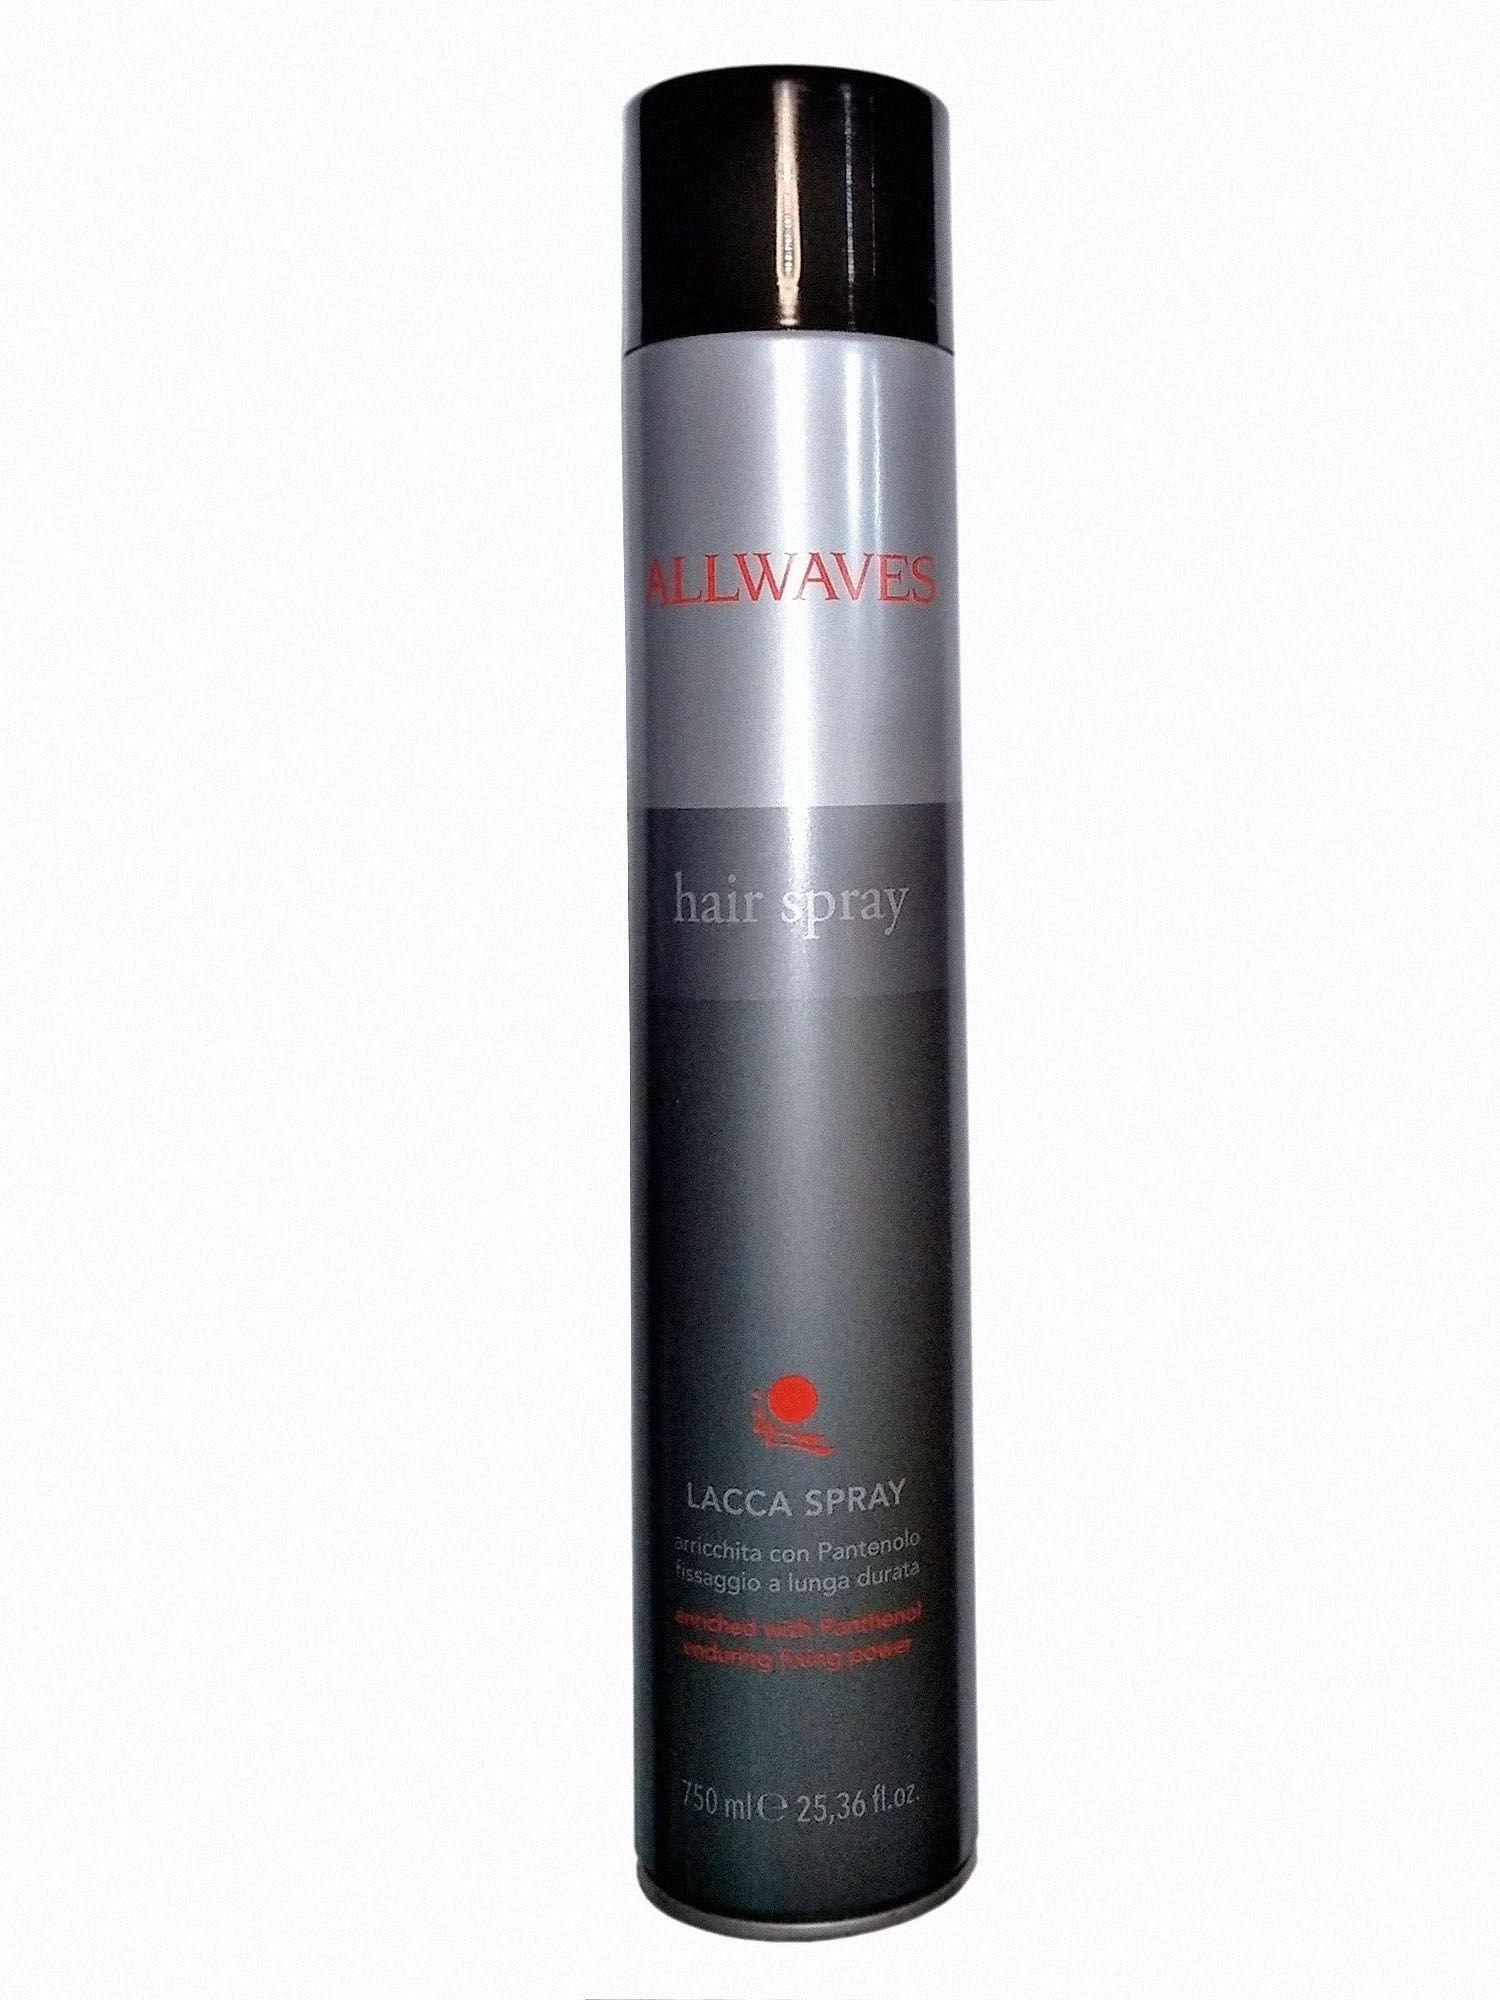 Spray de Cabelo Allwaves - Lacca Spray 750ml